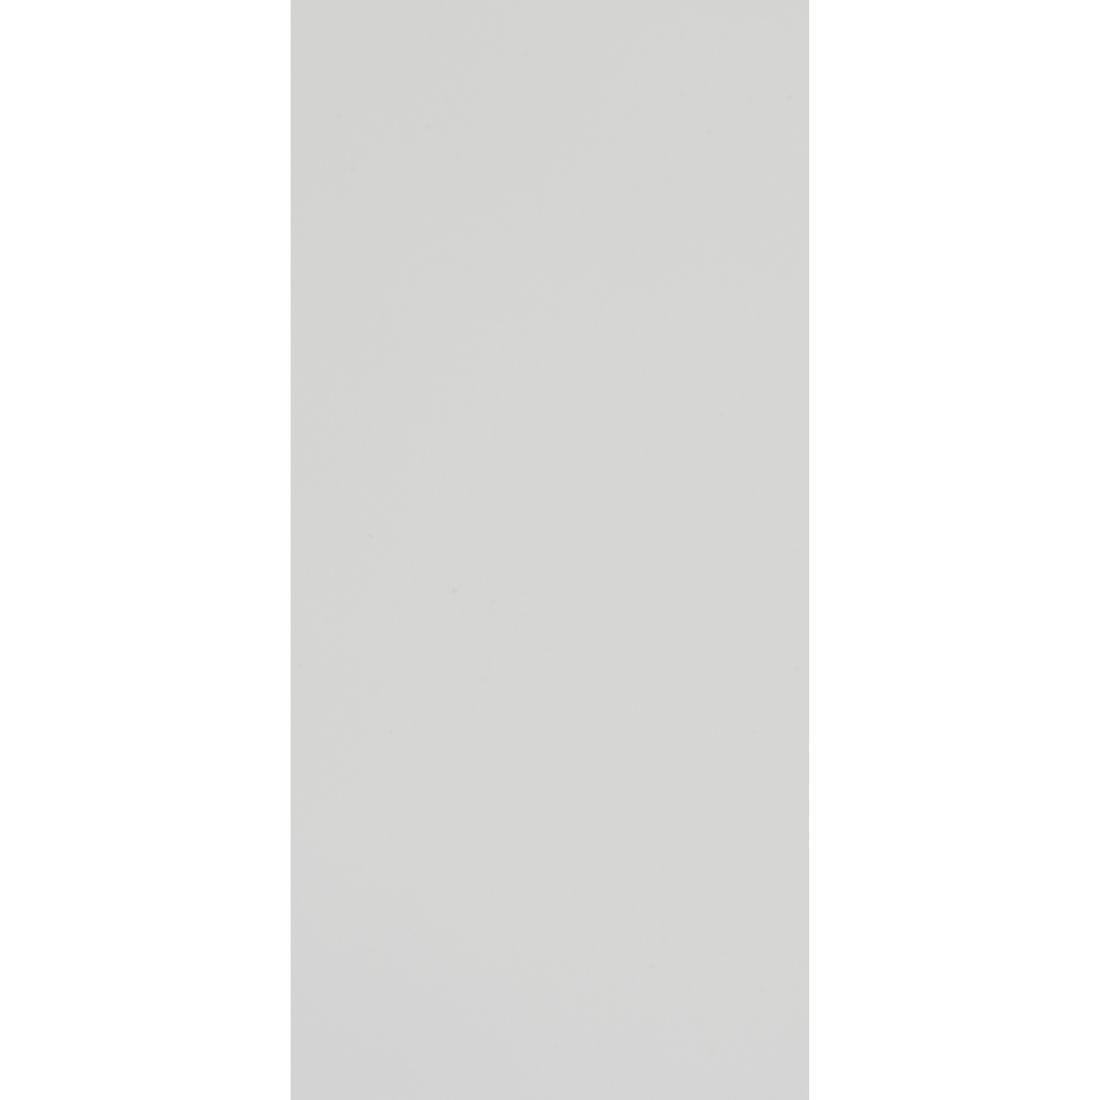 Classic Wall Lining Panel Nautilus Gloss 2400 x 1200 x 4.5mm